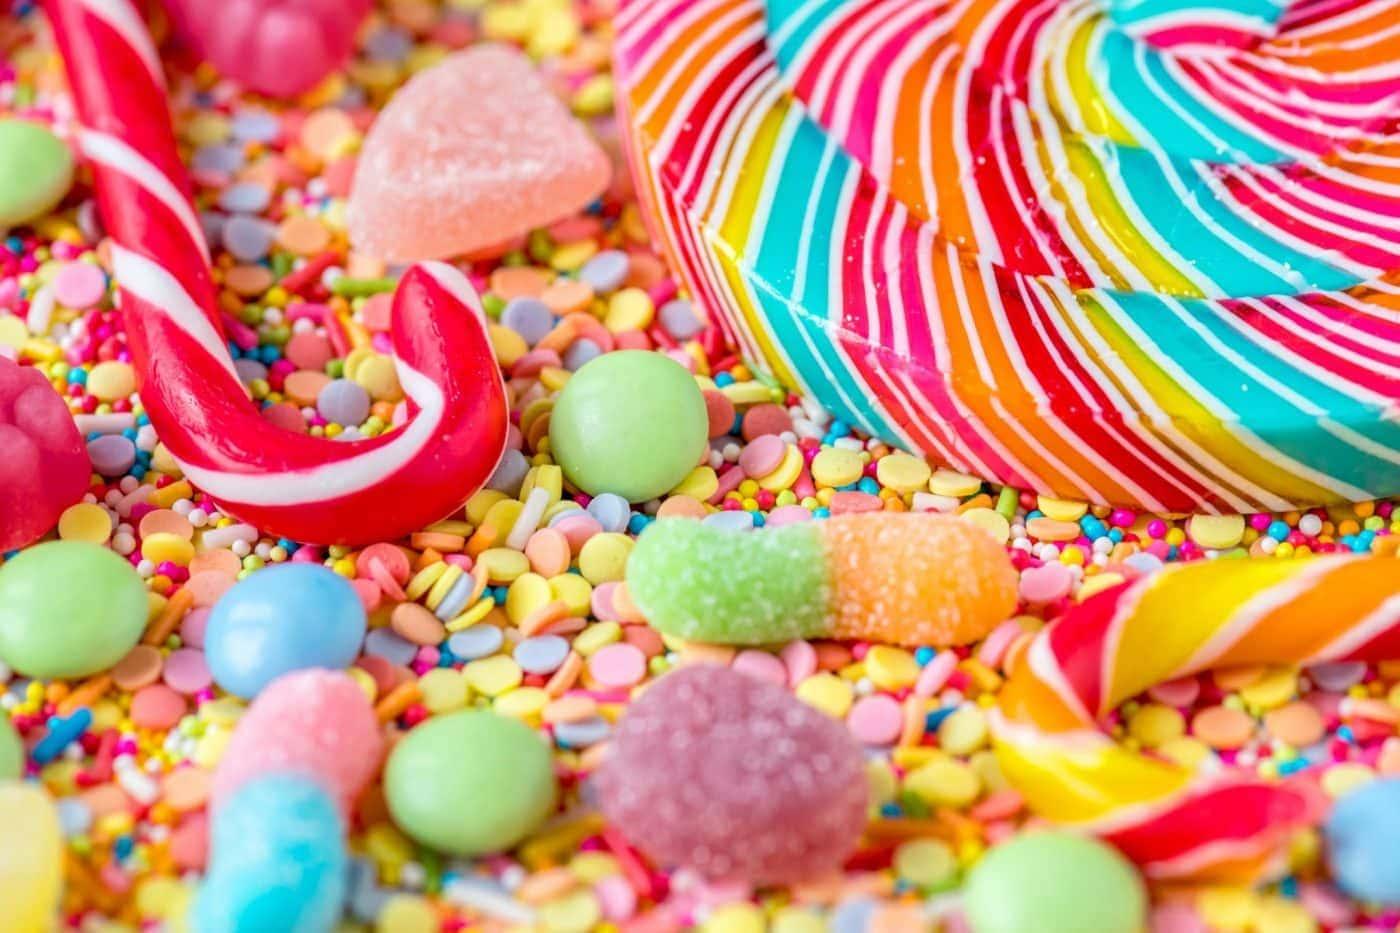 Sugar Danger - Sugar Affects Your Brain, Heart, Kidneys, Blood Pressure, and Weight